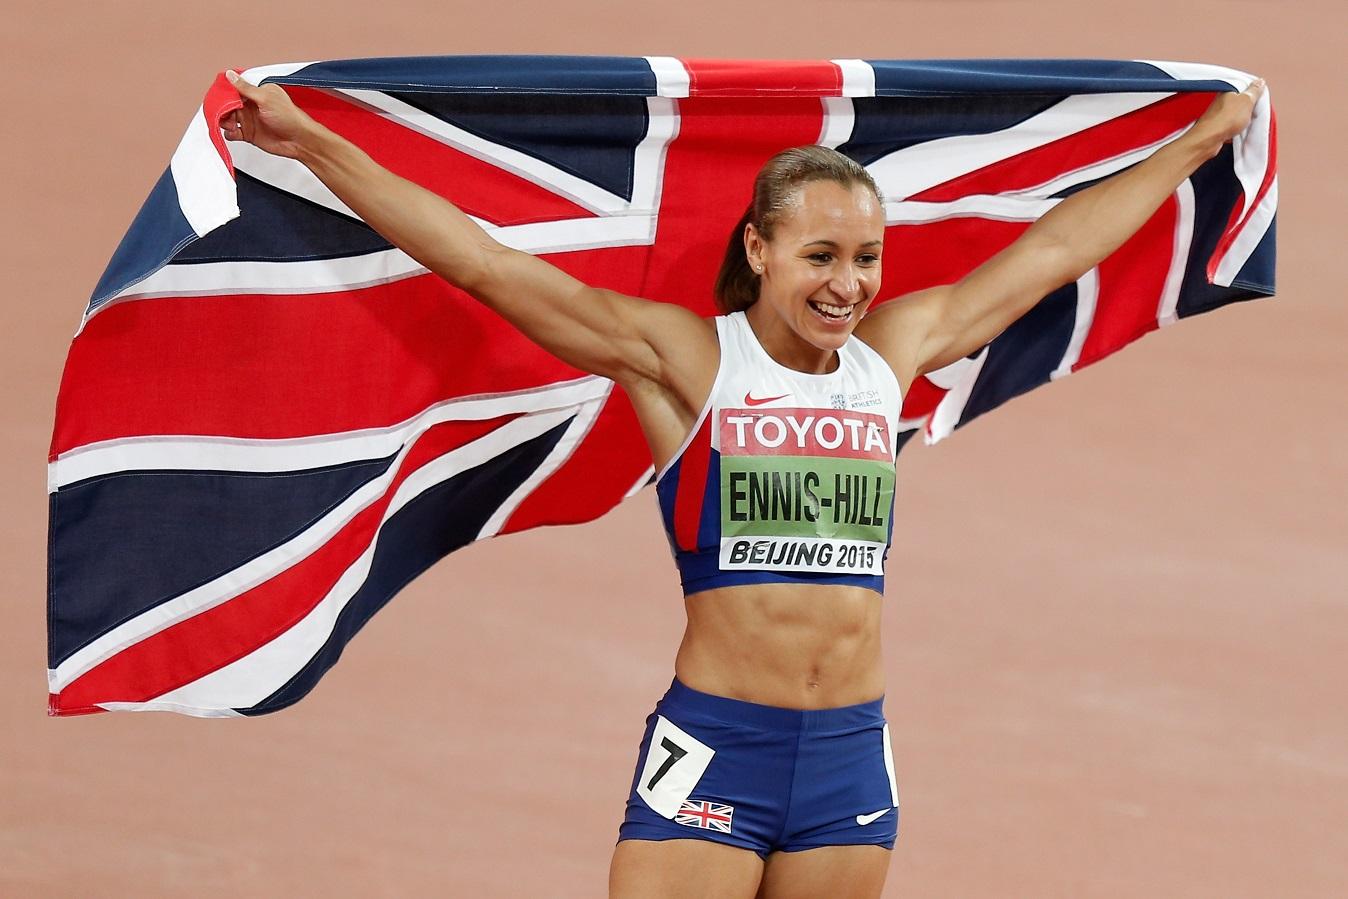 Jessica Ennis Hill (photo IAAF)